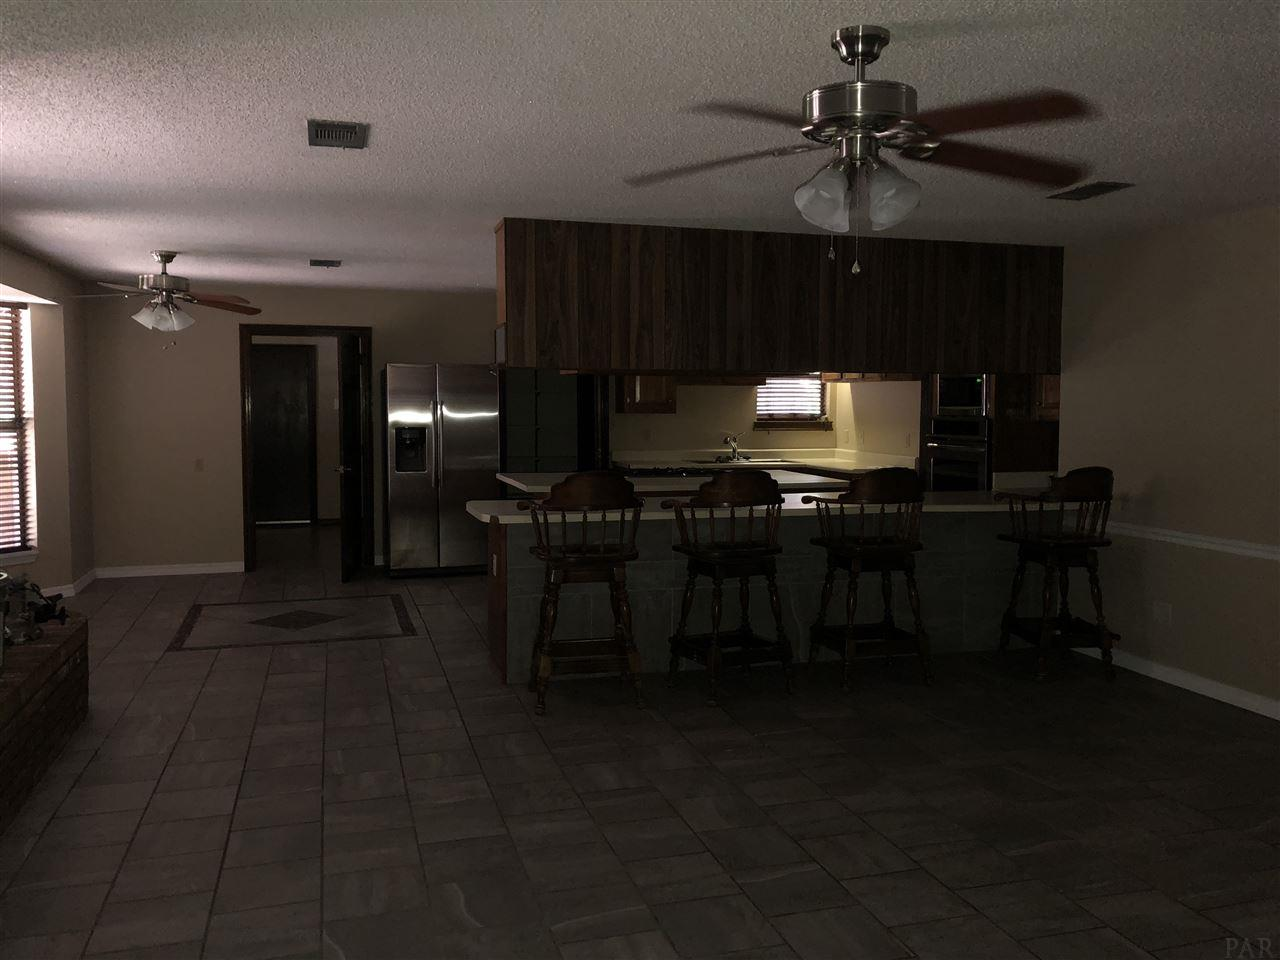 3578 Acy Lowery Rd, Pace, FL 32571